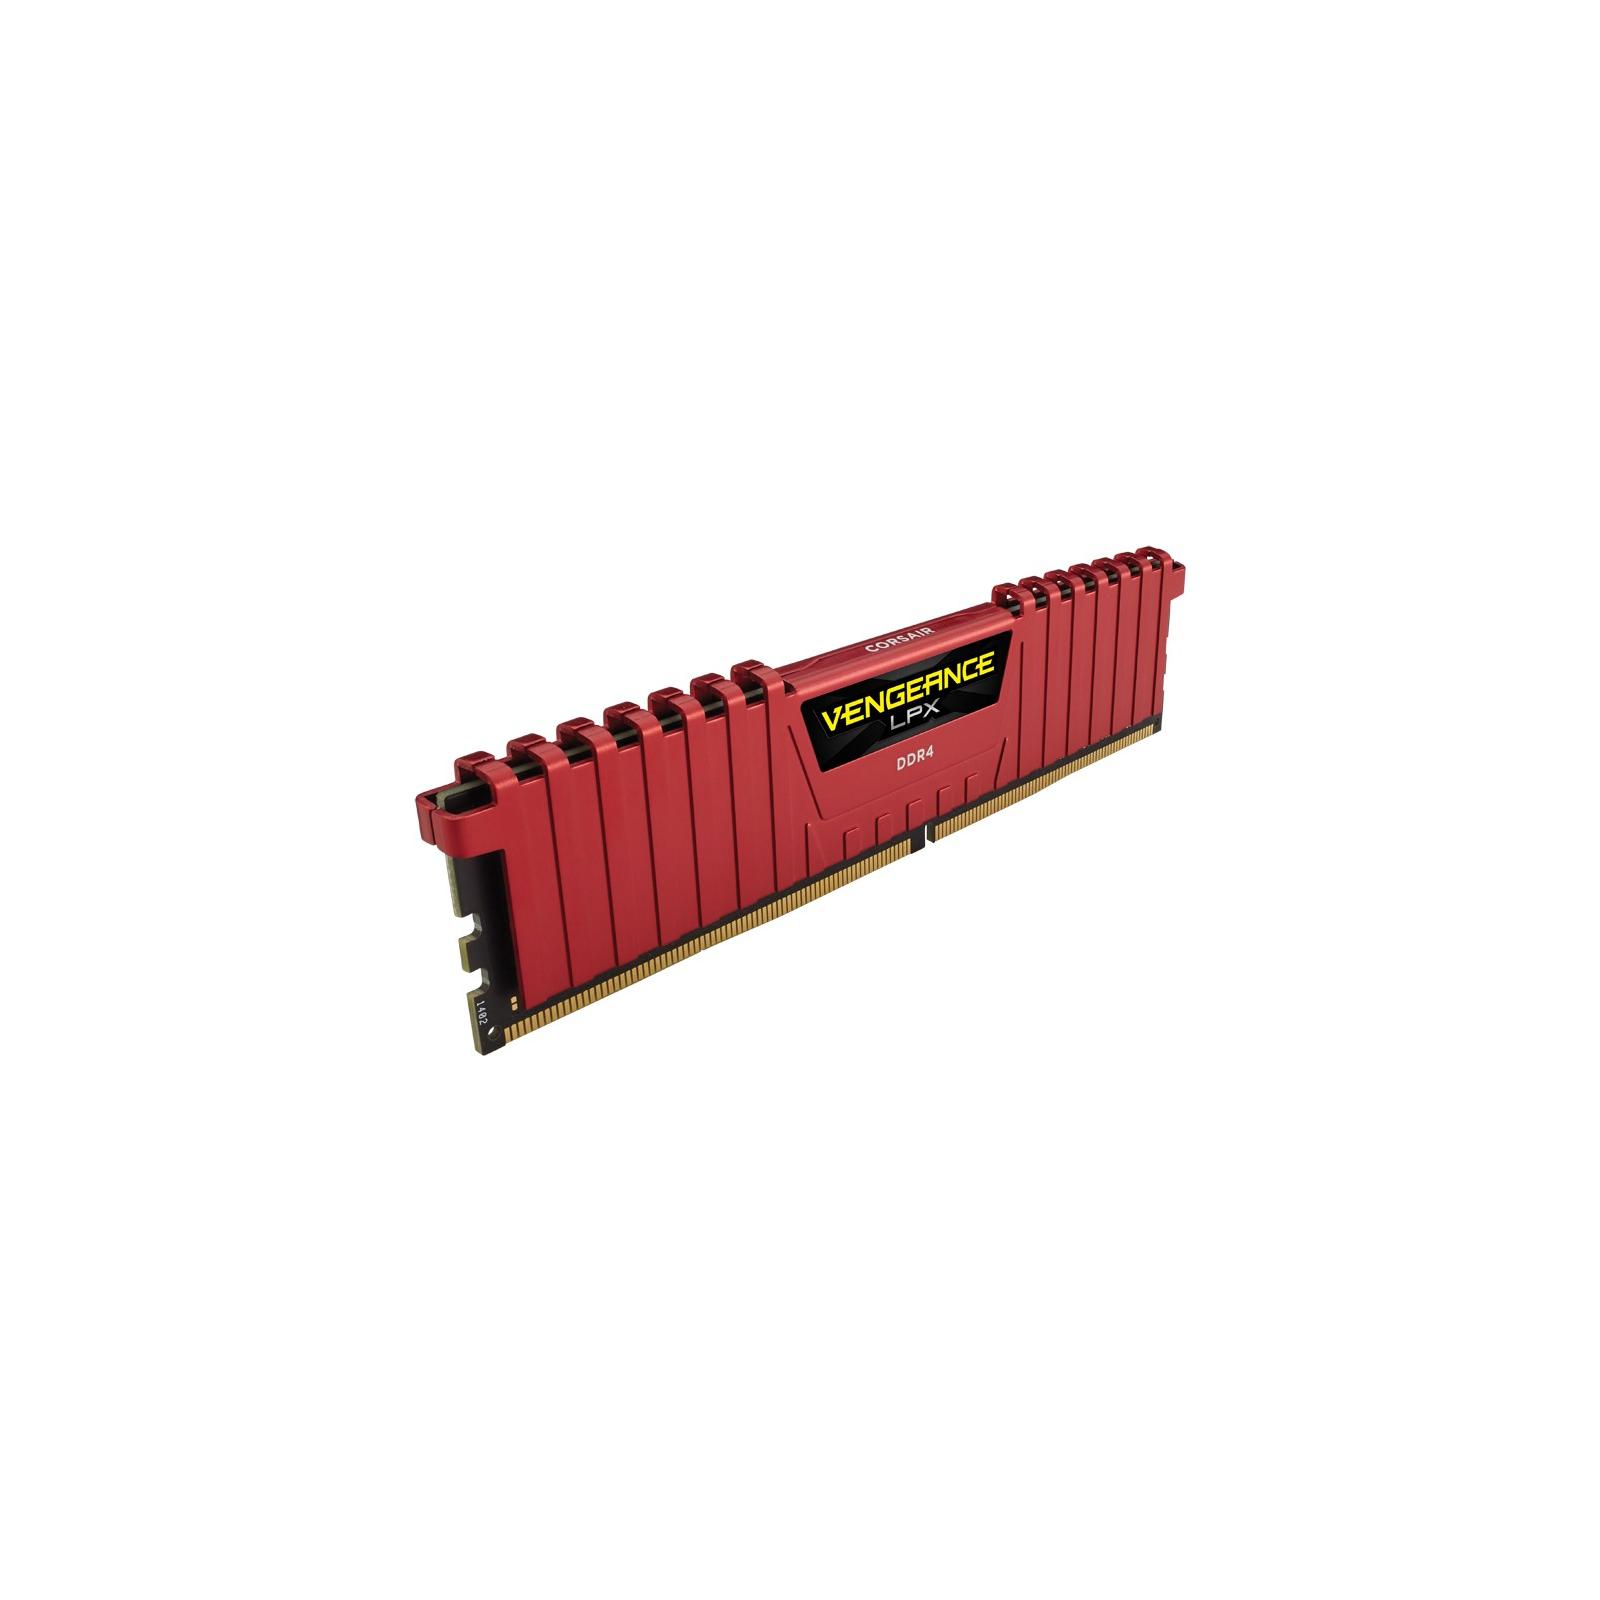 Модуль памяти для компьютера DDR4 8GB 2400 MHz Vengeance LPX Red CORSAIR (CMK8GX4M1A2400C14R) изображение 3